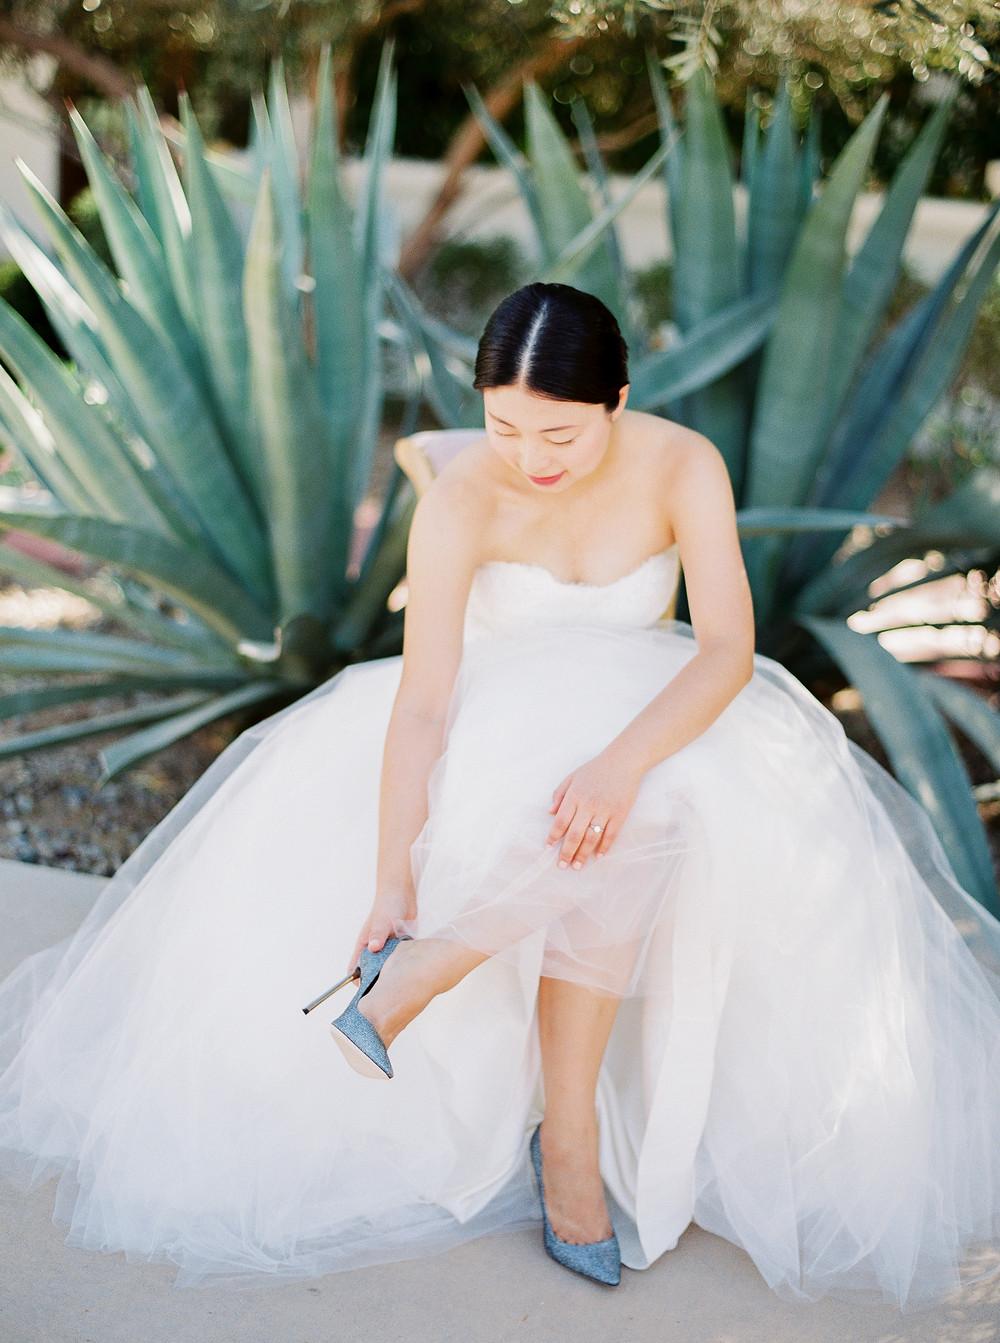 El Chorro Wedding, Traditional Chinese Wedding, Details, Moniique Lhuillier, Jimmy Choo